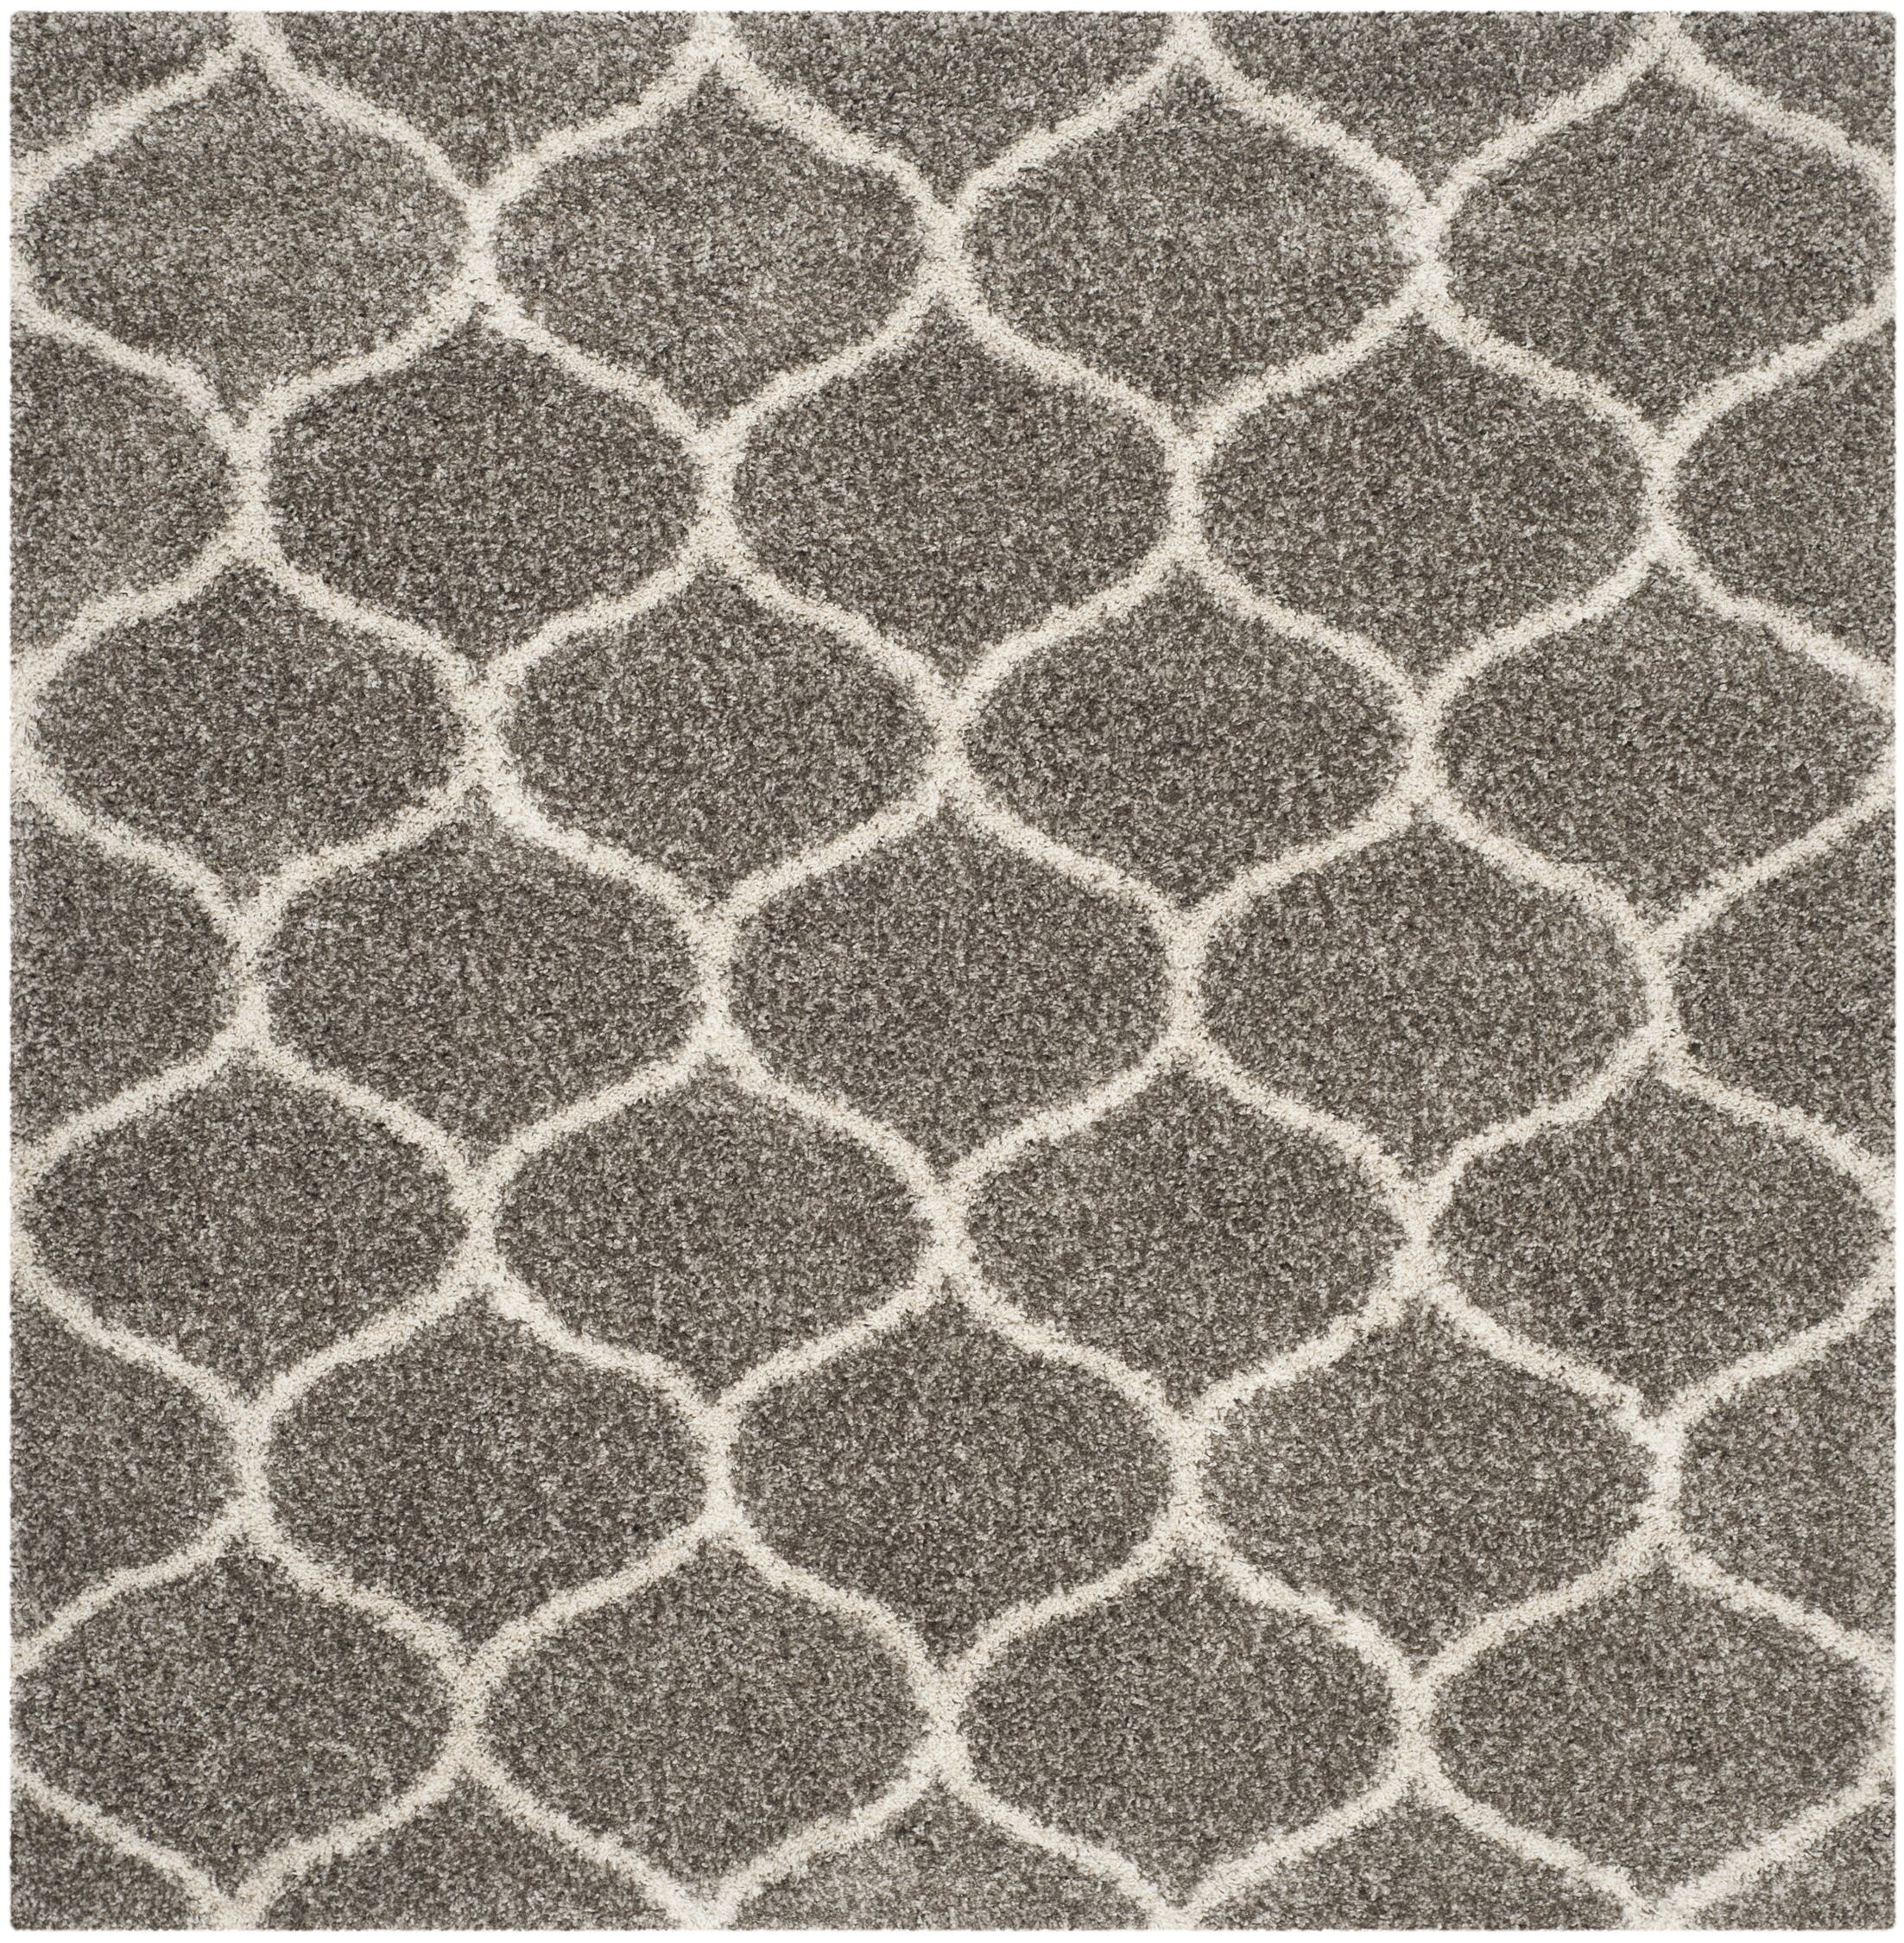 Elizabeth Street Gray/Ivory Area Rug Rug Size: Square 7' x 7'